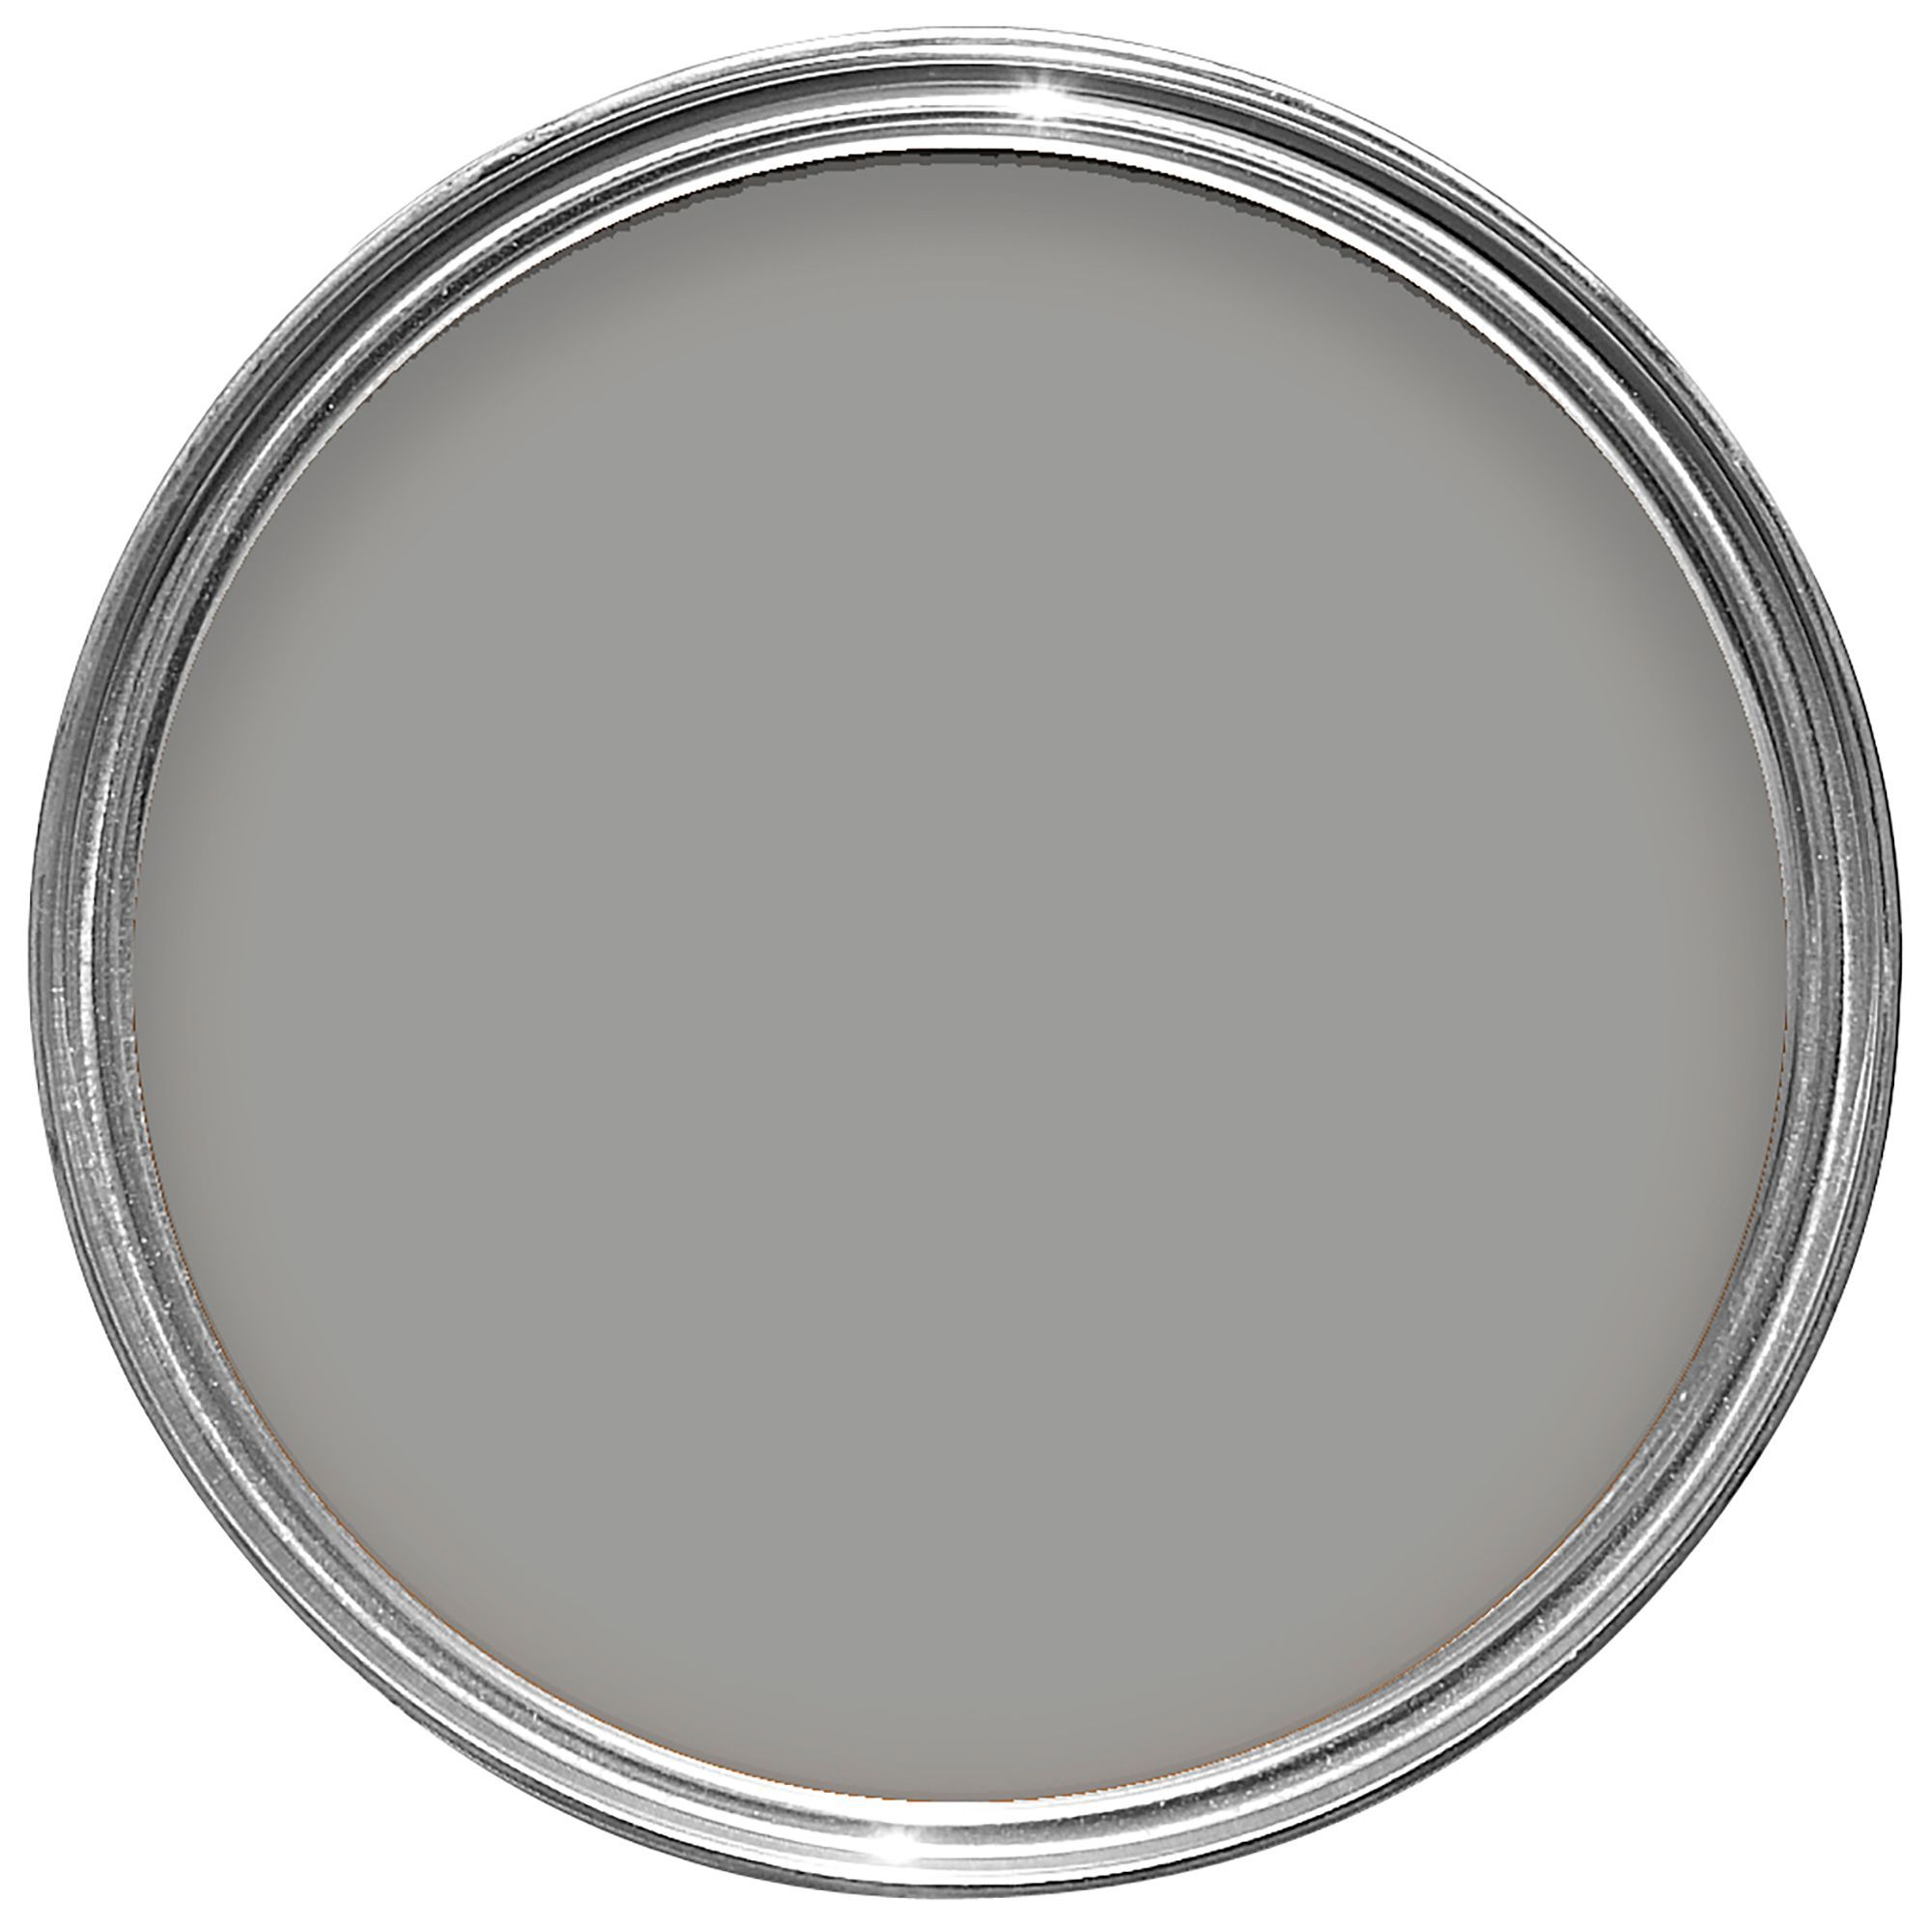 Dulux Weathershield Concrete Grey Smooth Masonry Paint 5l